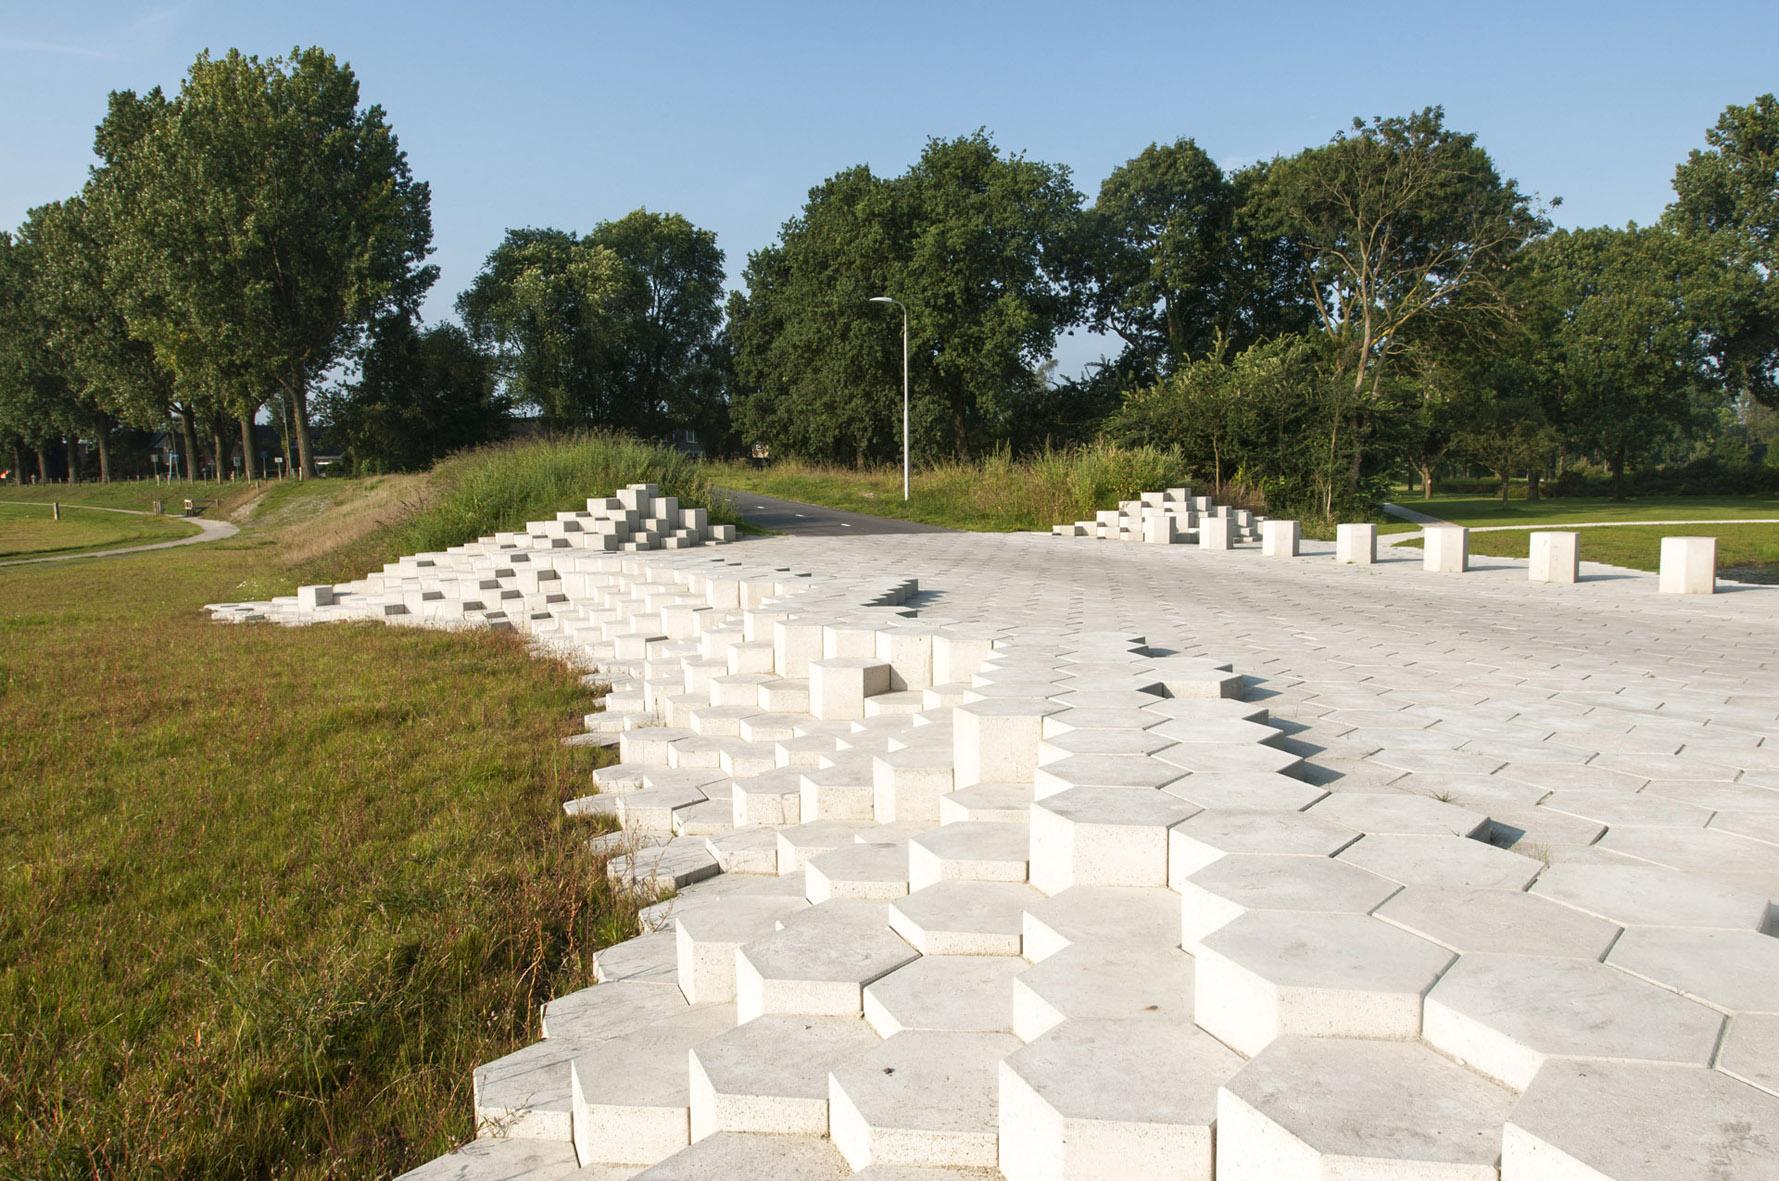 Nederland, Hardenberg, 26-8-2016VechtparkFoto: Ton van Vliet/Terborg